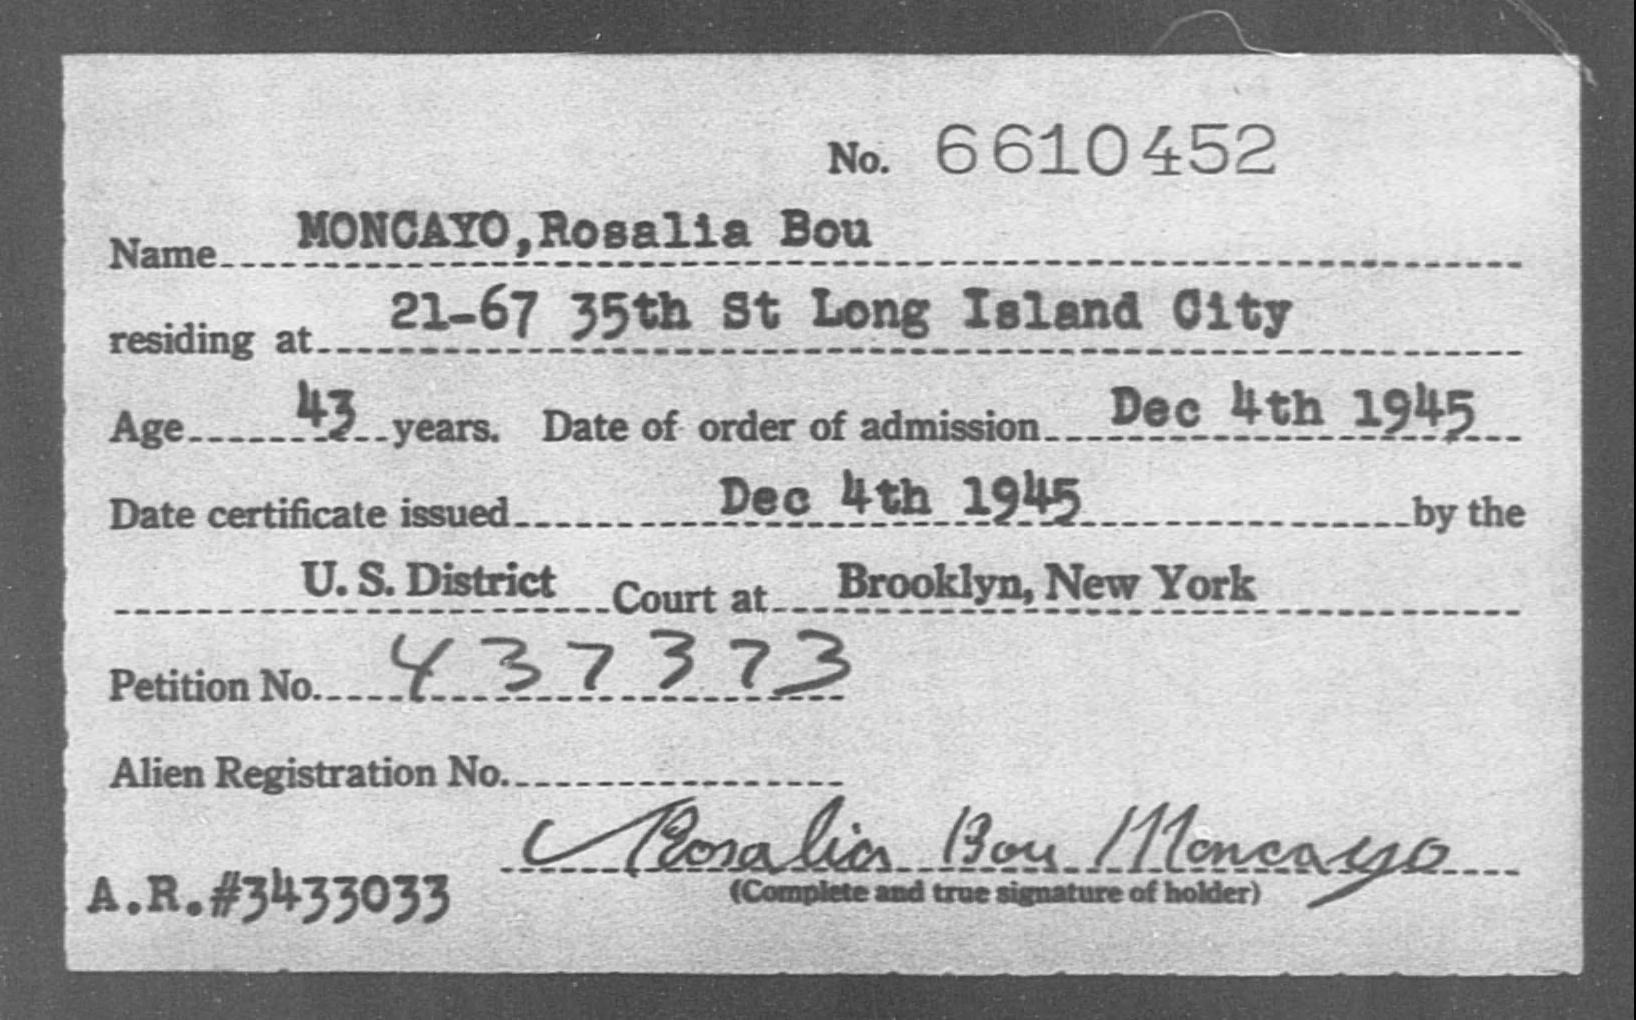 MONCAYO, Rosalia Bou - Born: [BLANK], Naturalized: 1945